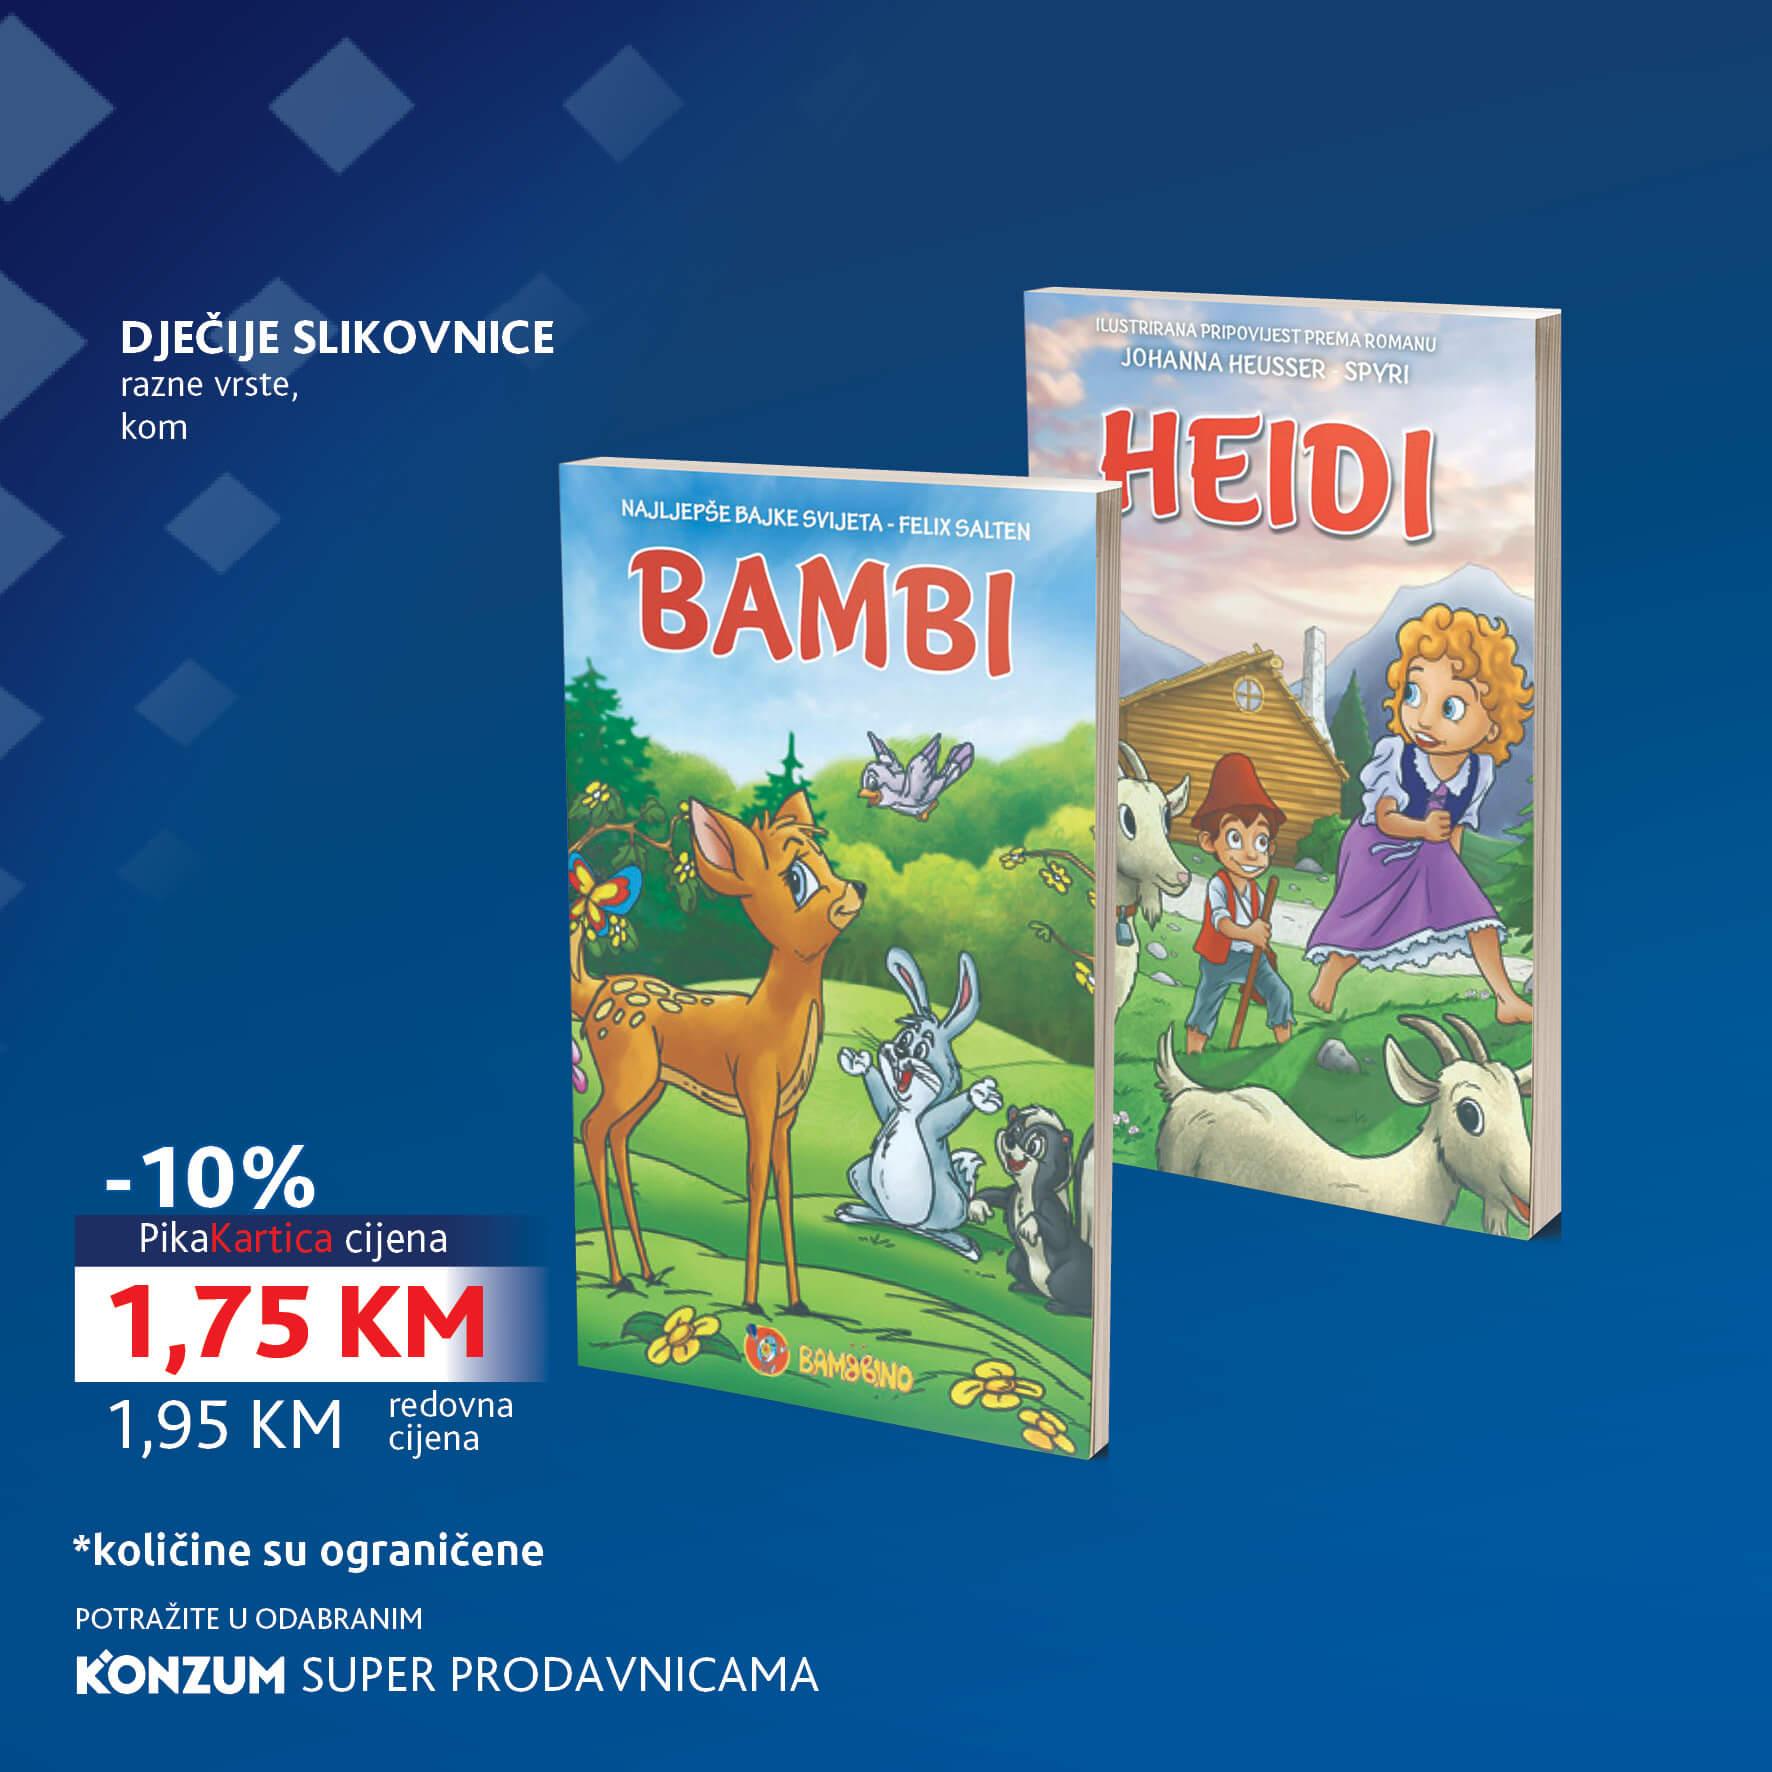 KONZUM Katalog PIKA Kartica AKCIJA MAJ 2021 01.05.2021. 31.05.2021. Page 24